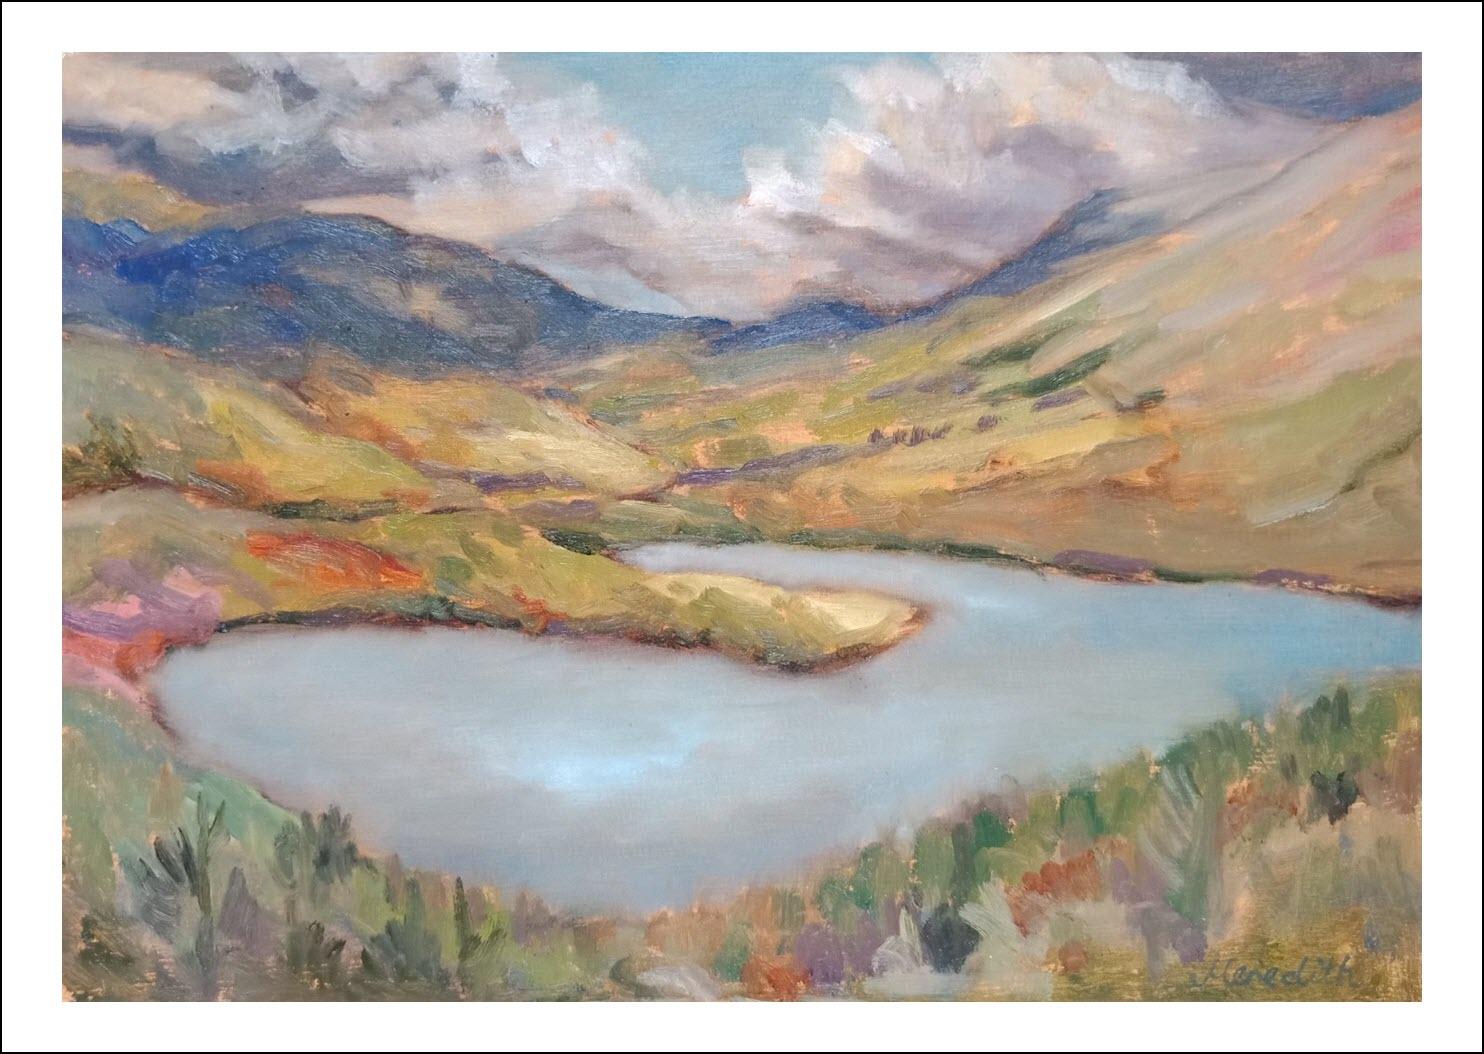 54. Lake Rotoiti from the Base of Mt. Robert